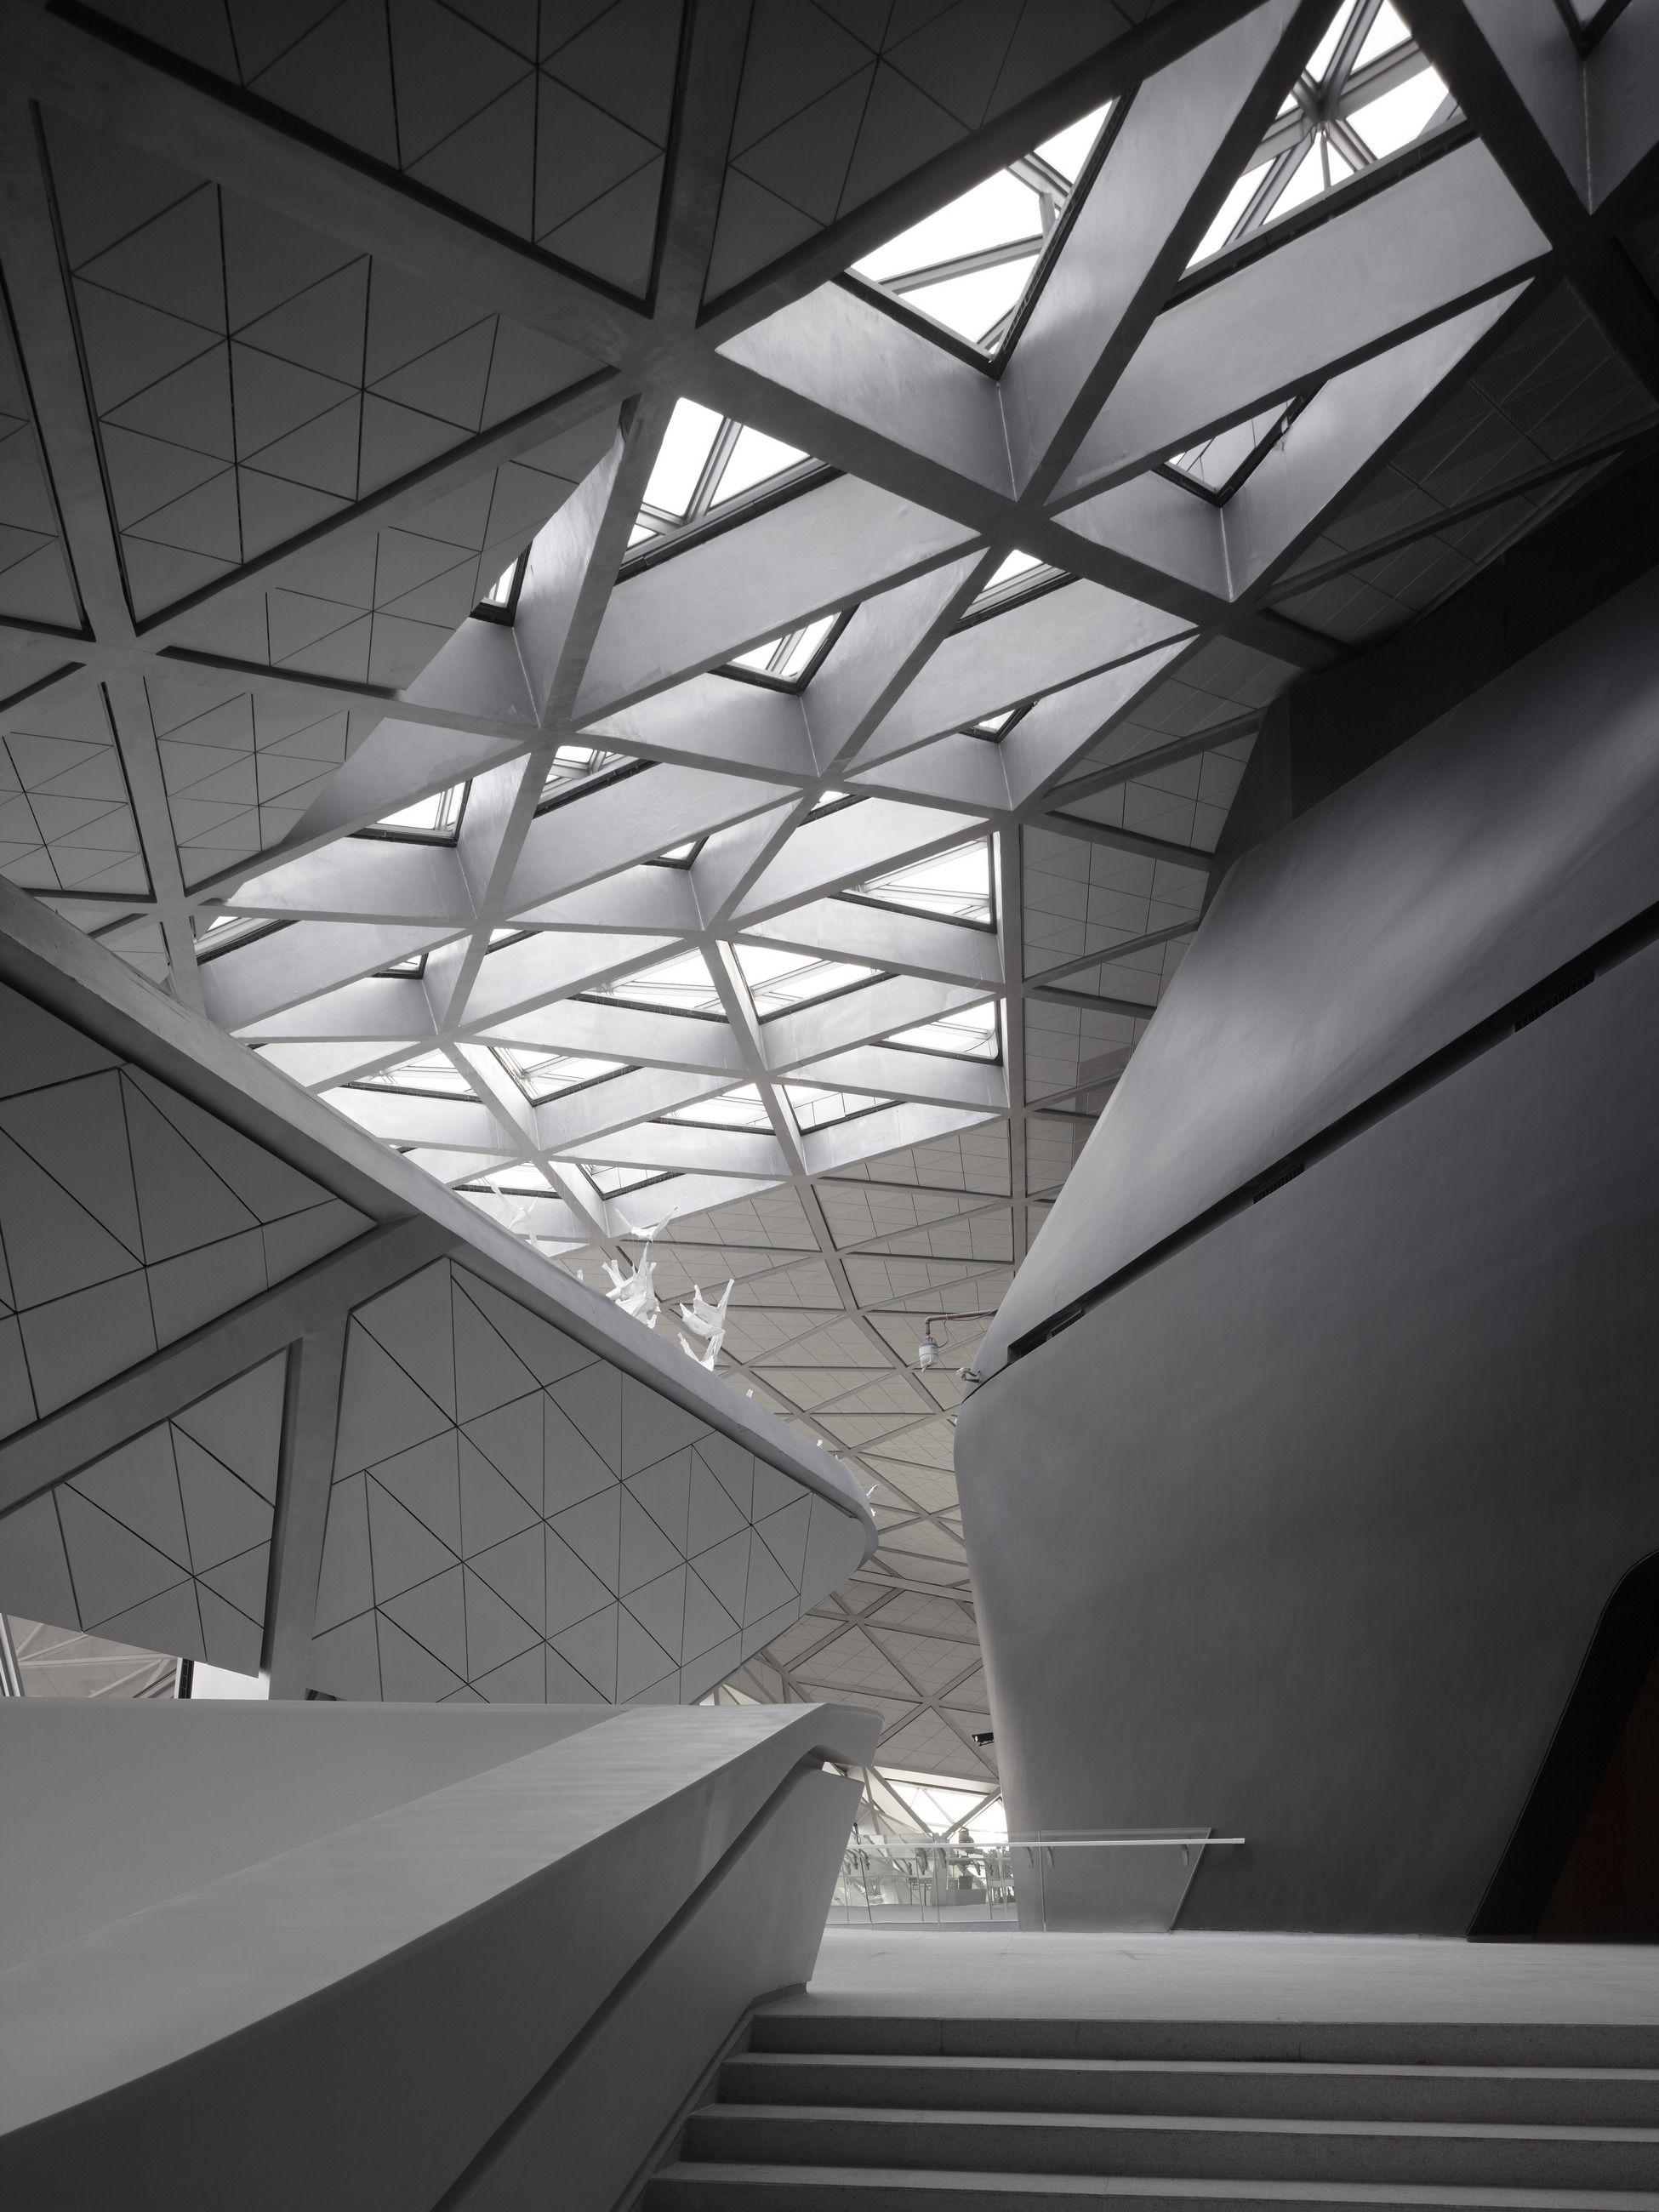 Archello zaha hadid architects pinterest architektur - Zaha hadid architektur ...